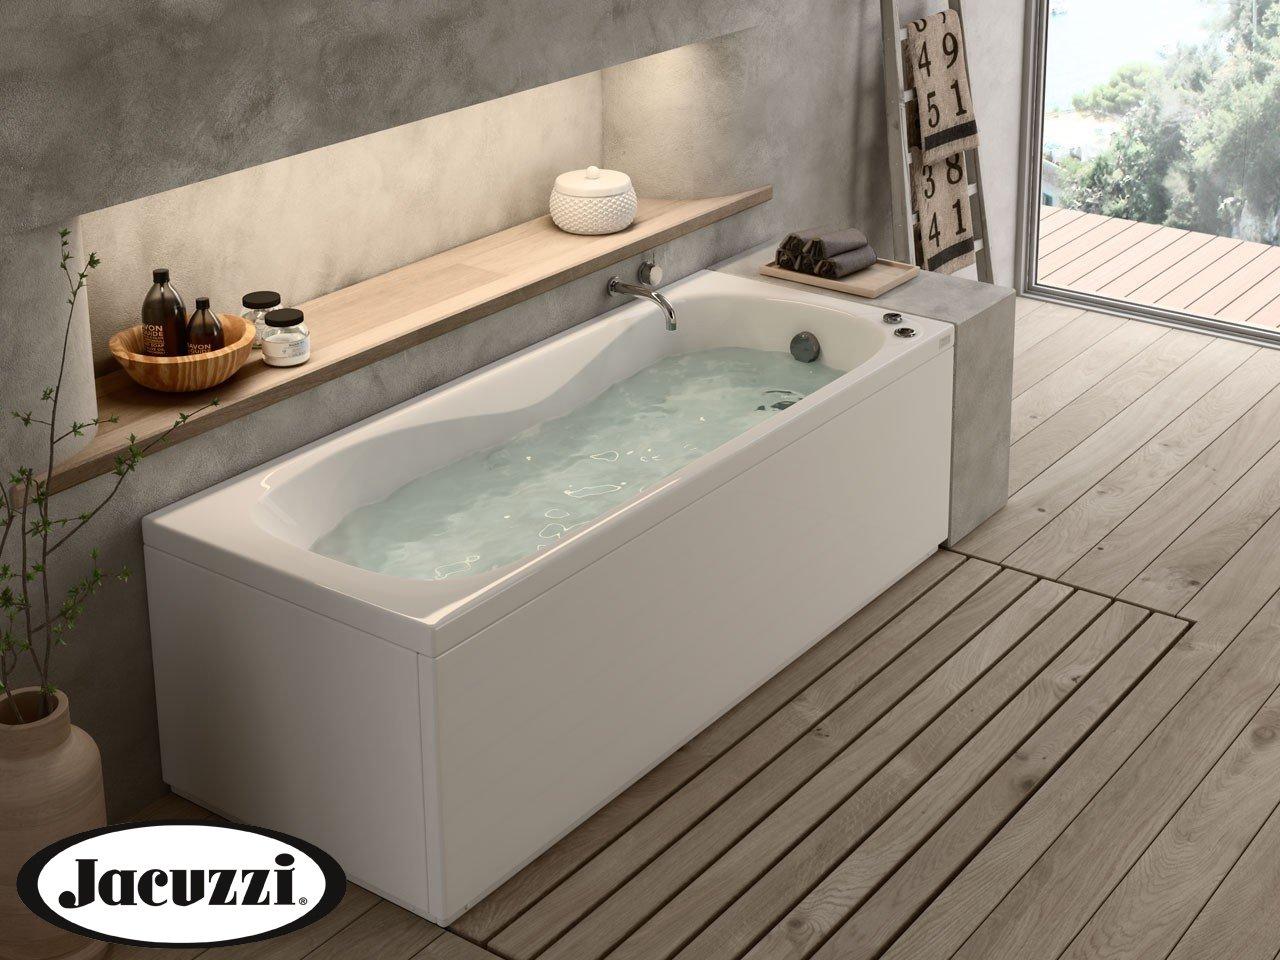 Jacuzzi soho vasca idro 170x70 sx pan fr lat iperceramica - Ricoprire vasca da bagno prezzi ...